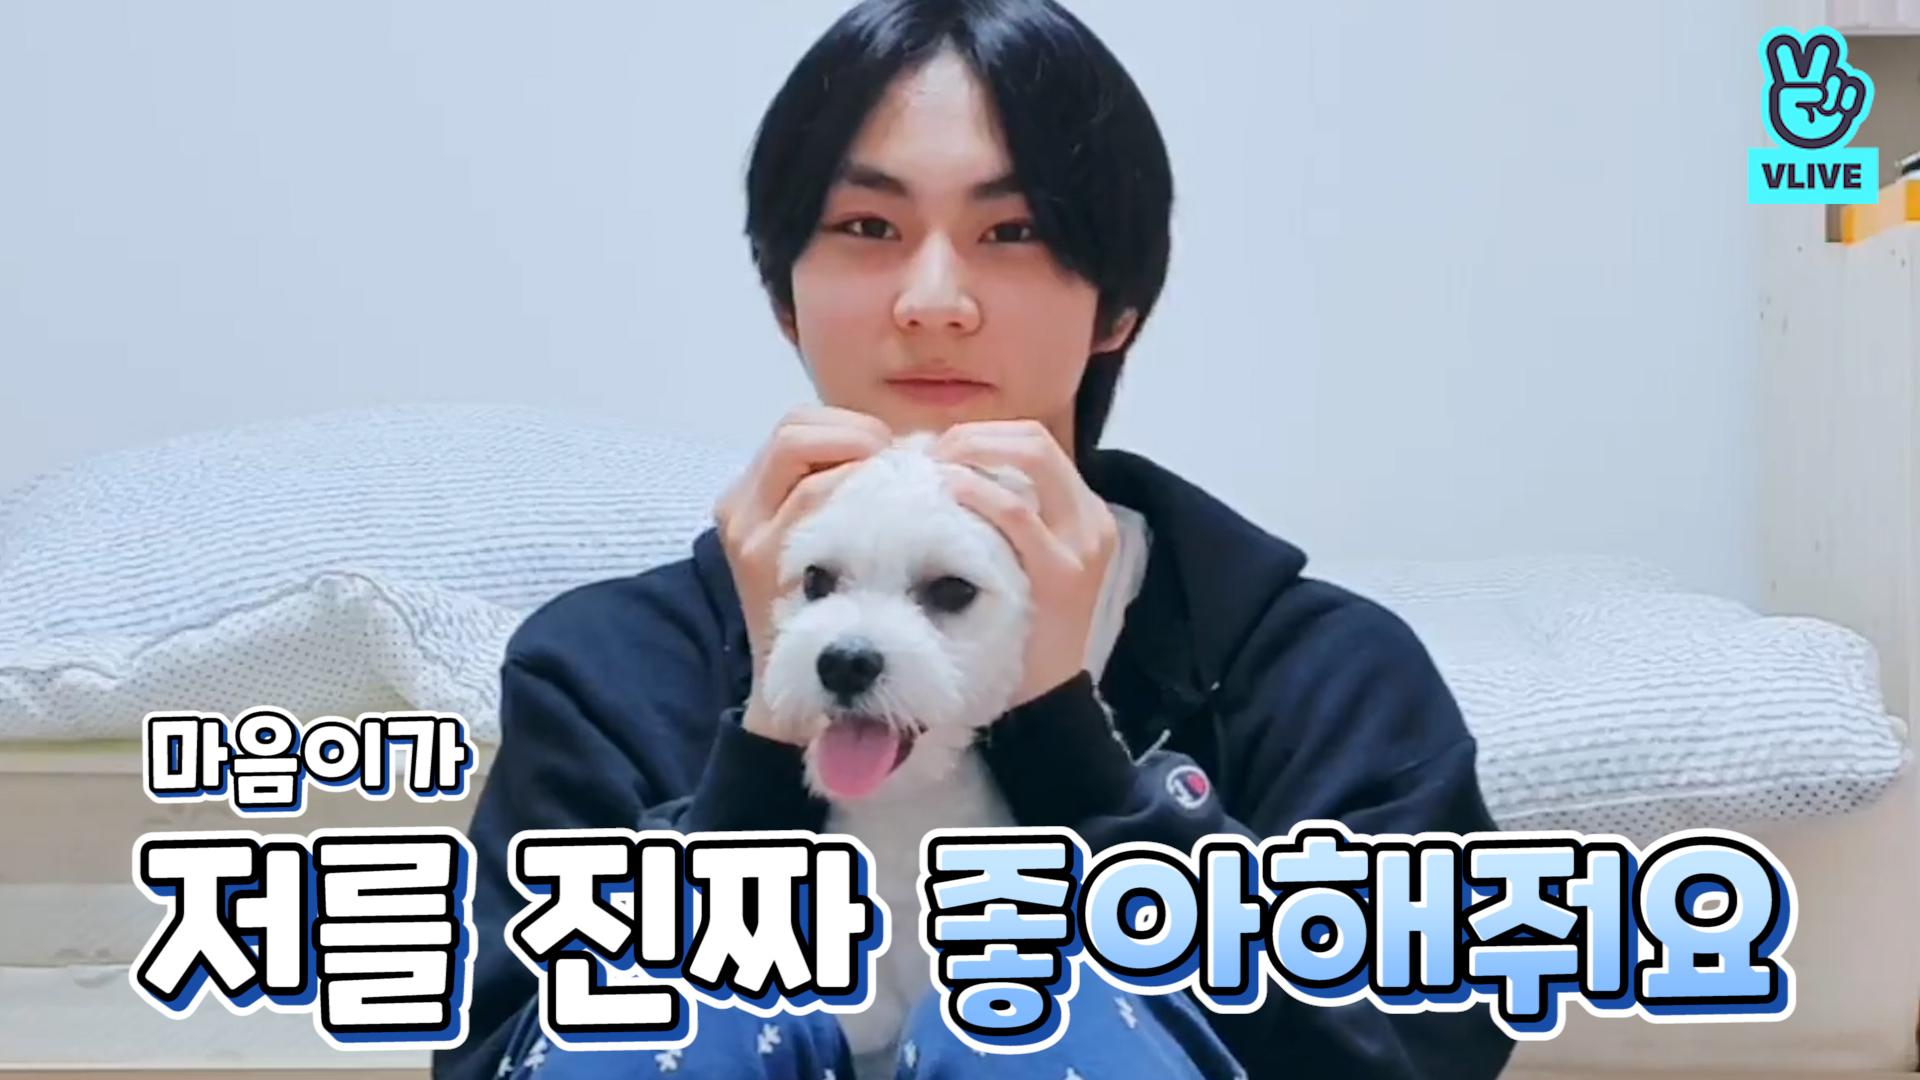 [ENHYPEN] 진짜 완전 리얼 귀여운 ㅁr음0l와 마음이🐾 (JUNGWON's V with his puppy)